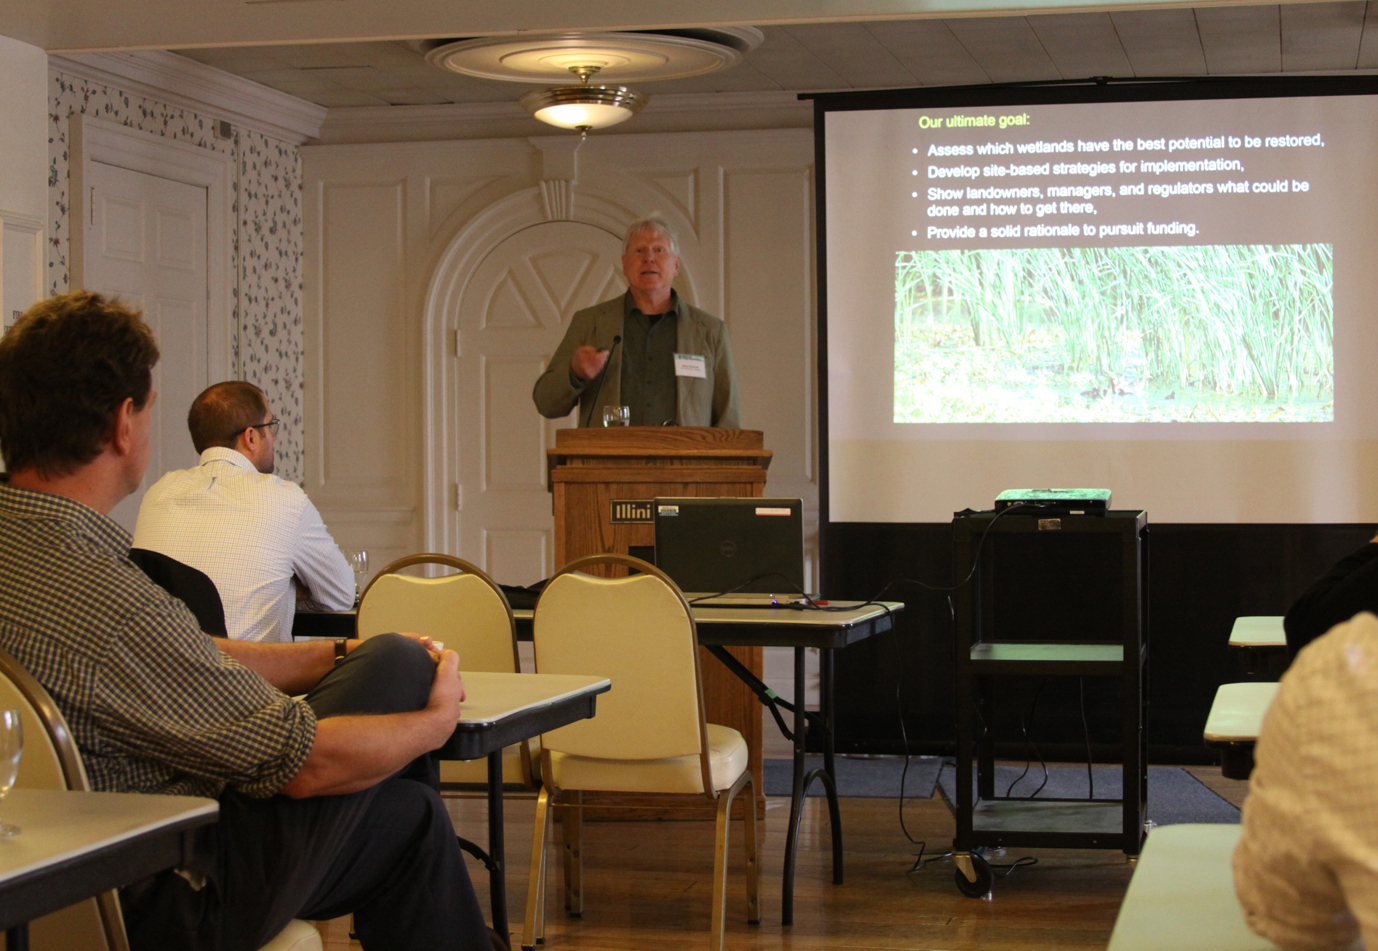 TWI Senior Ecologist Dr. Gary Sullivan presents during a conference session on hemi-marsh restoration in Chicago's Calumet region.